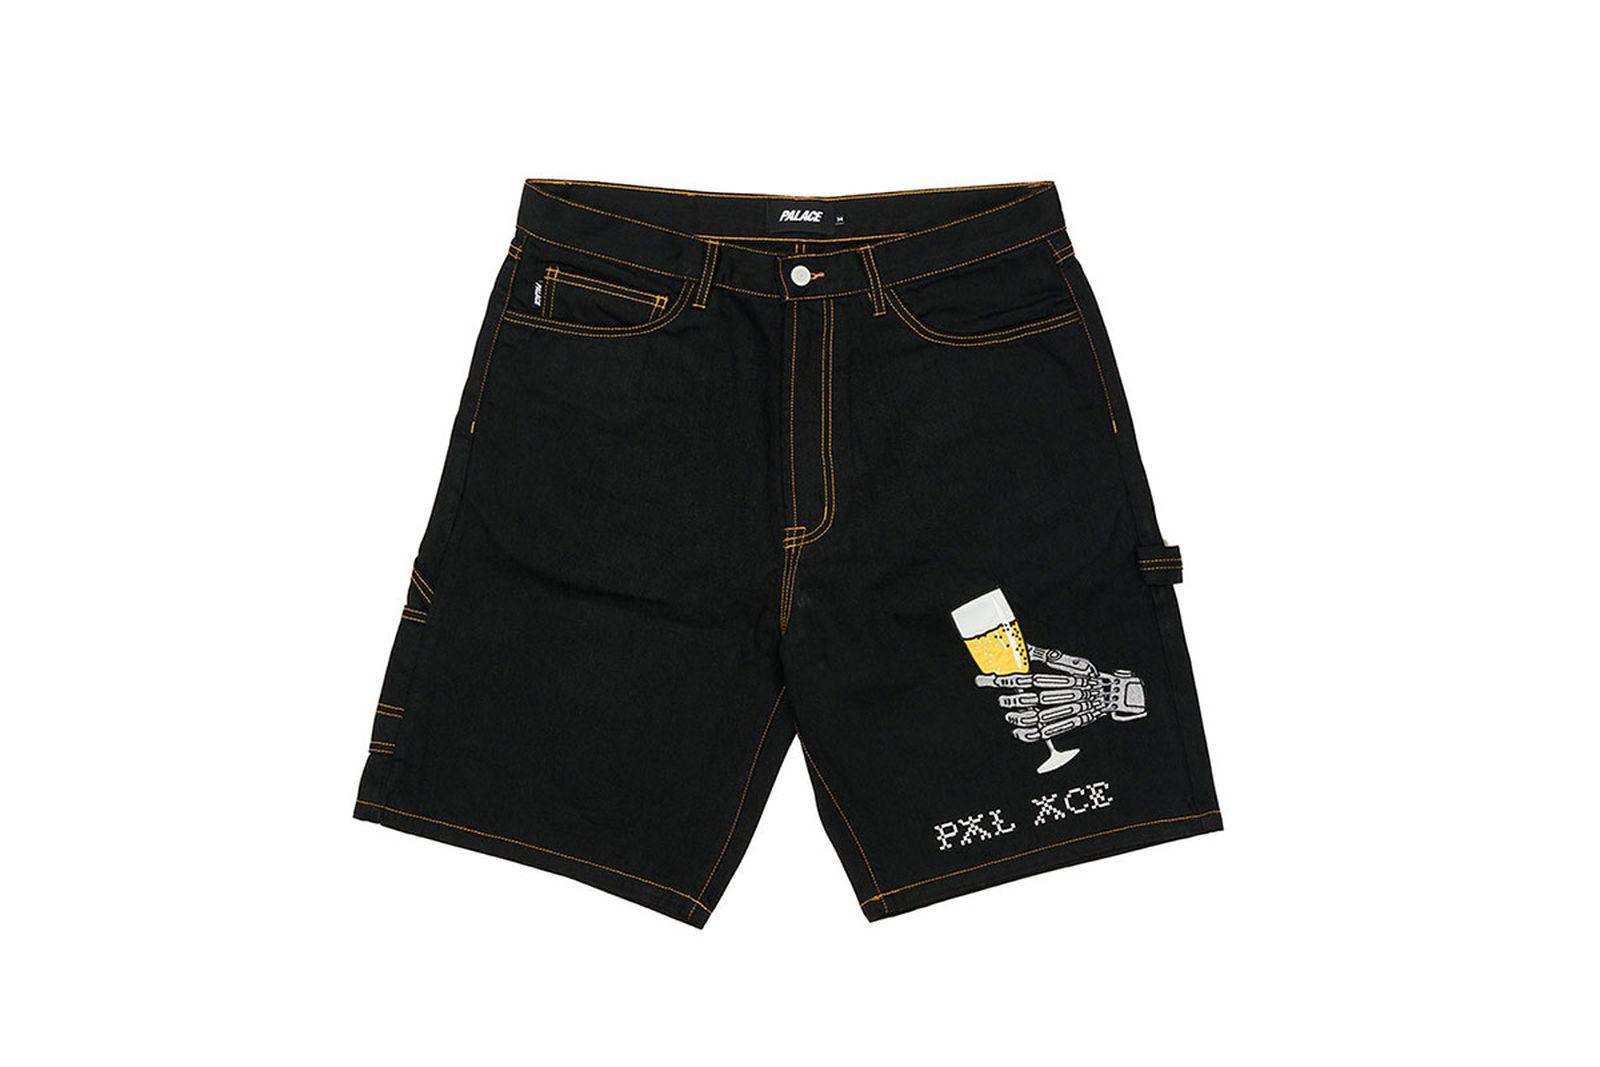 palace-crocs-classic-clog-release-date-price-25